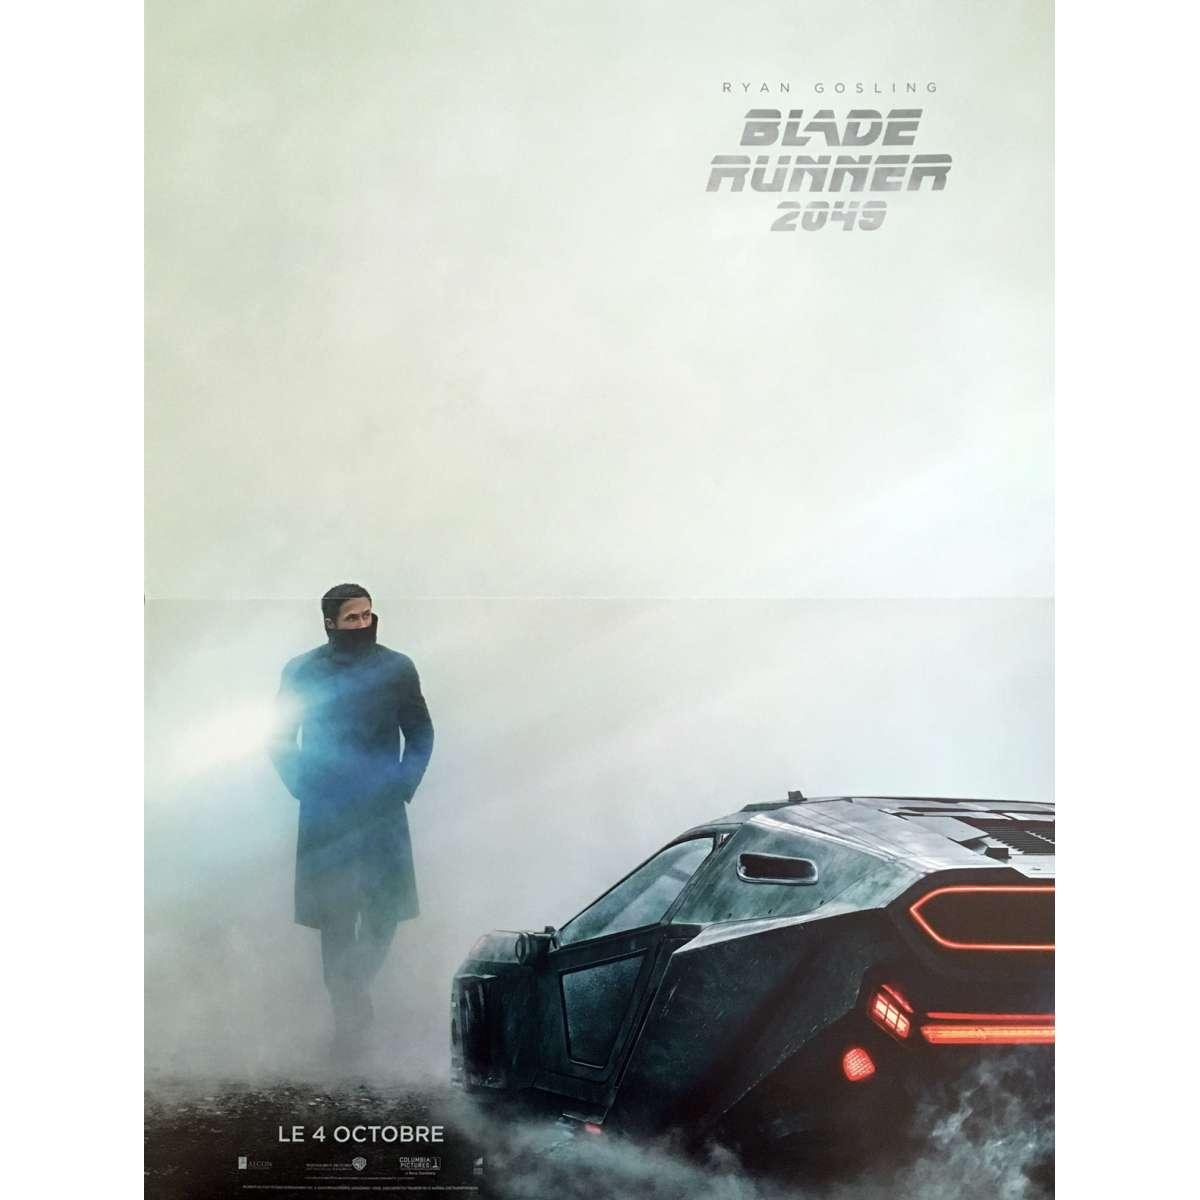 BLADE RUNNER 2049 Movie Poster 15x21 in.